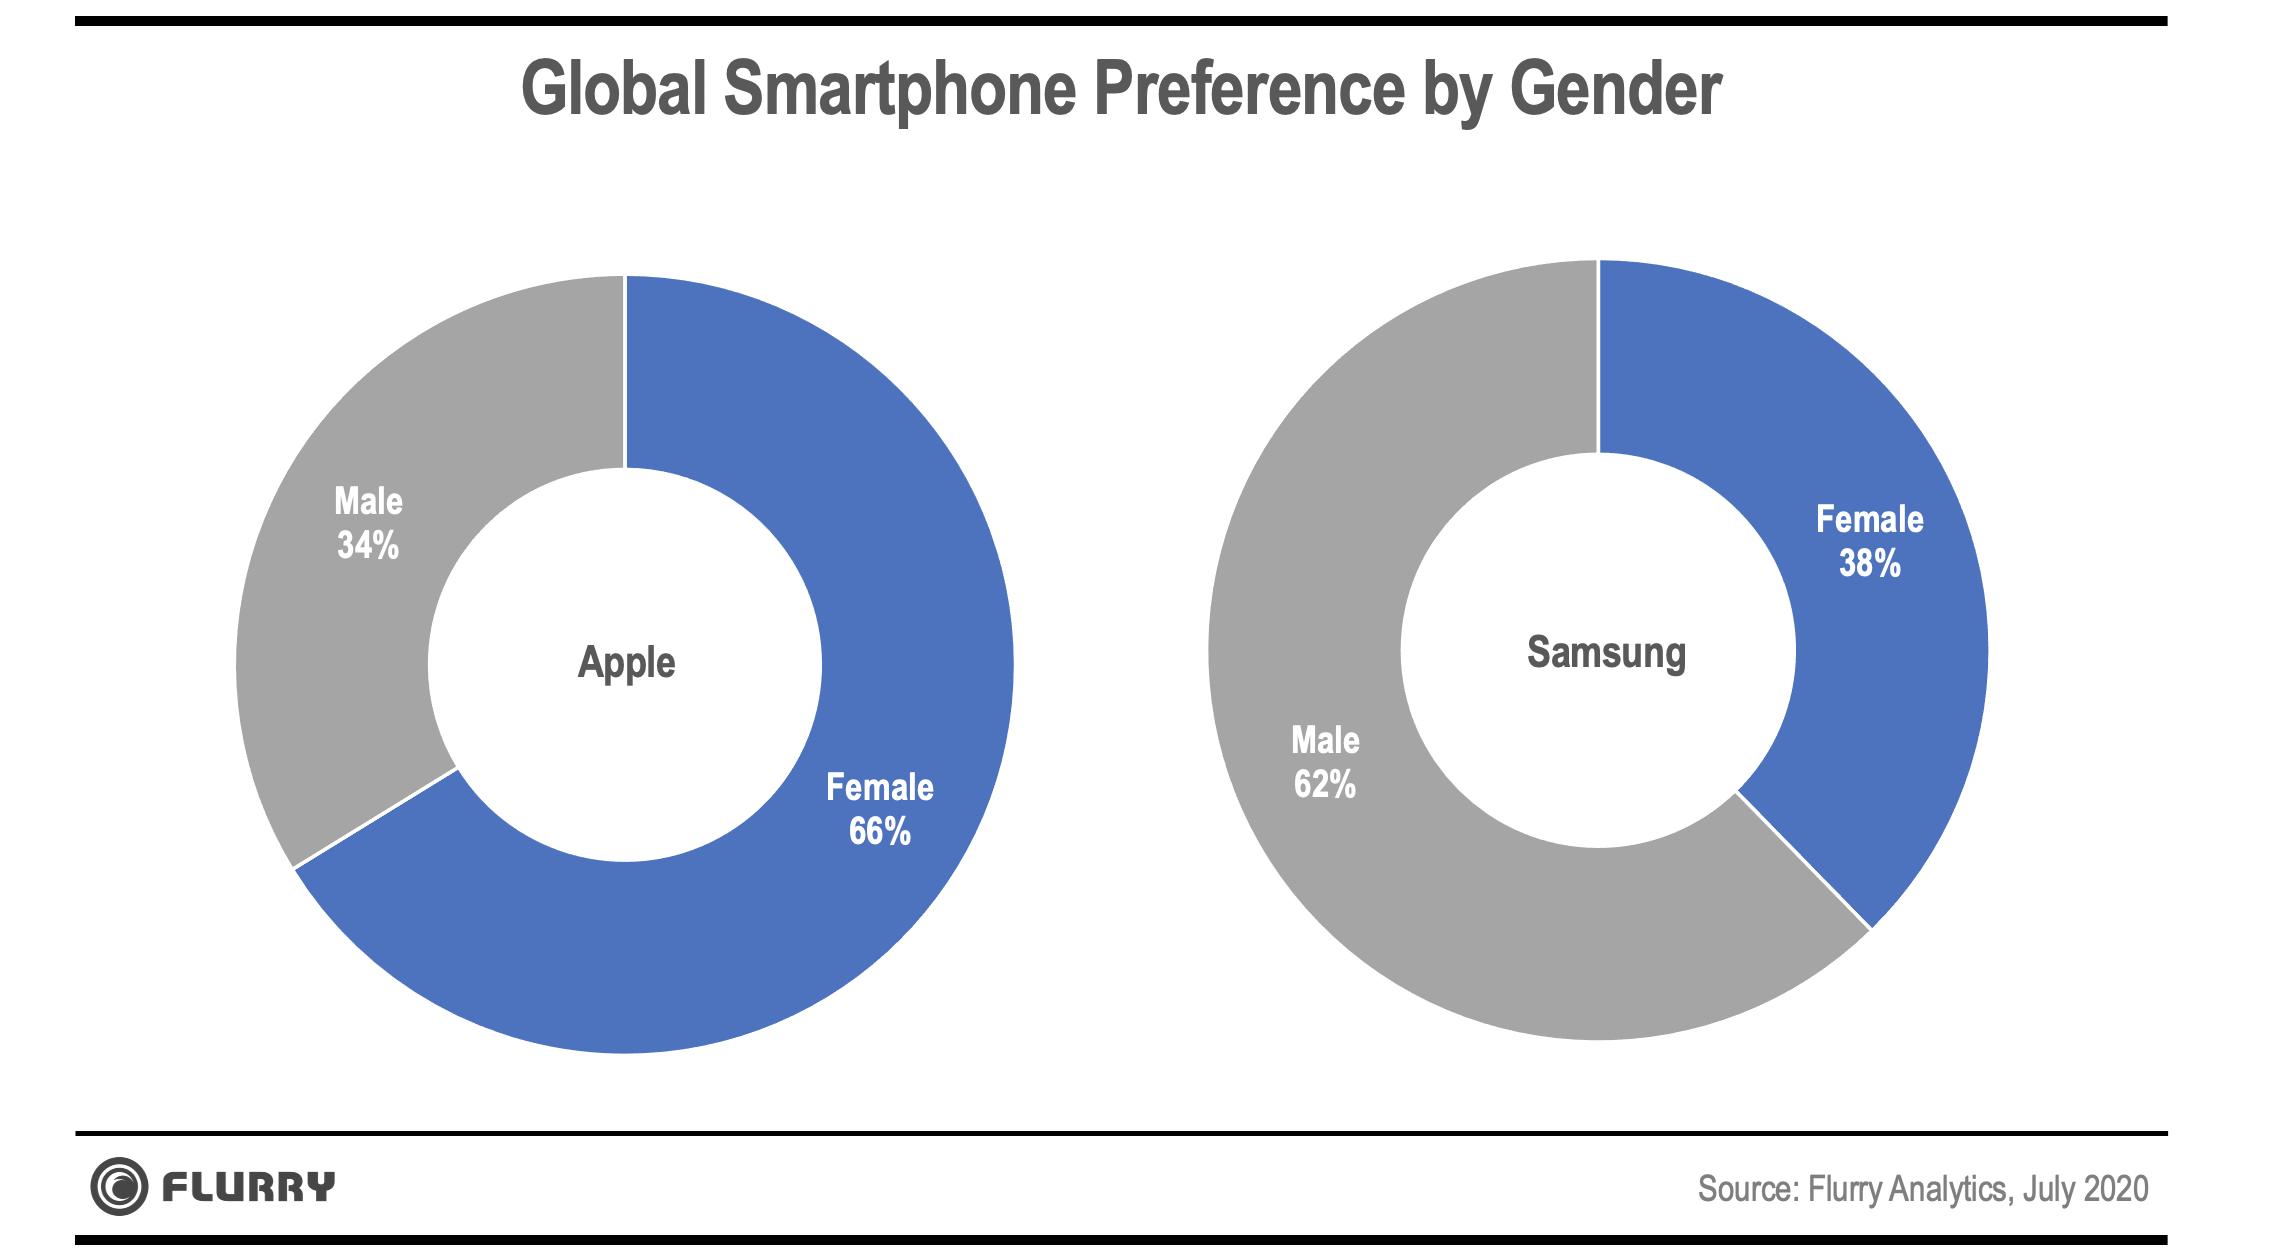 Global Smartphone Preference by Gender